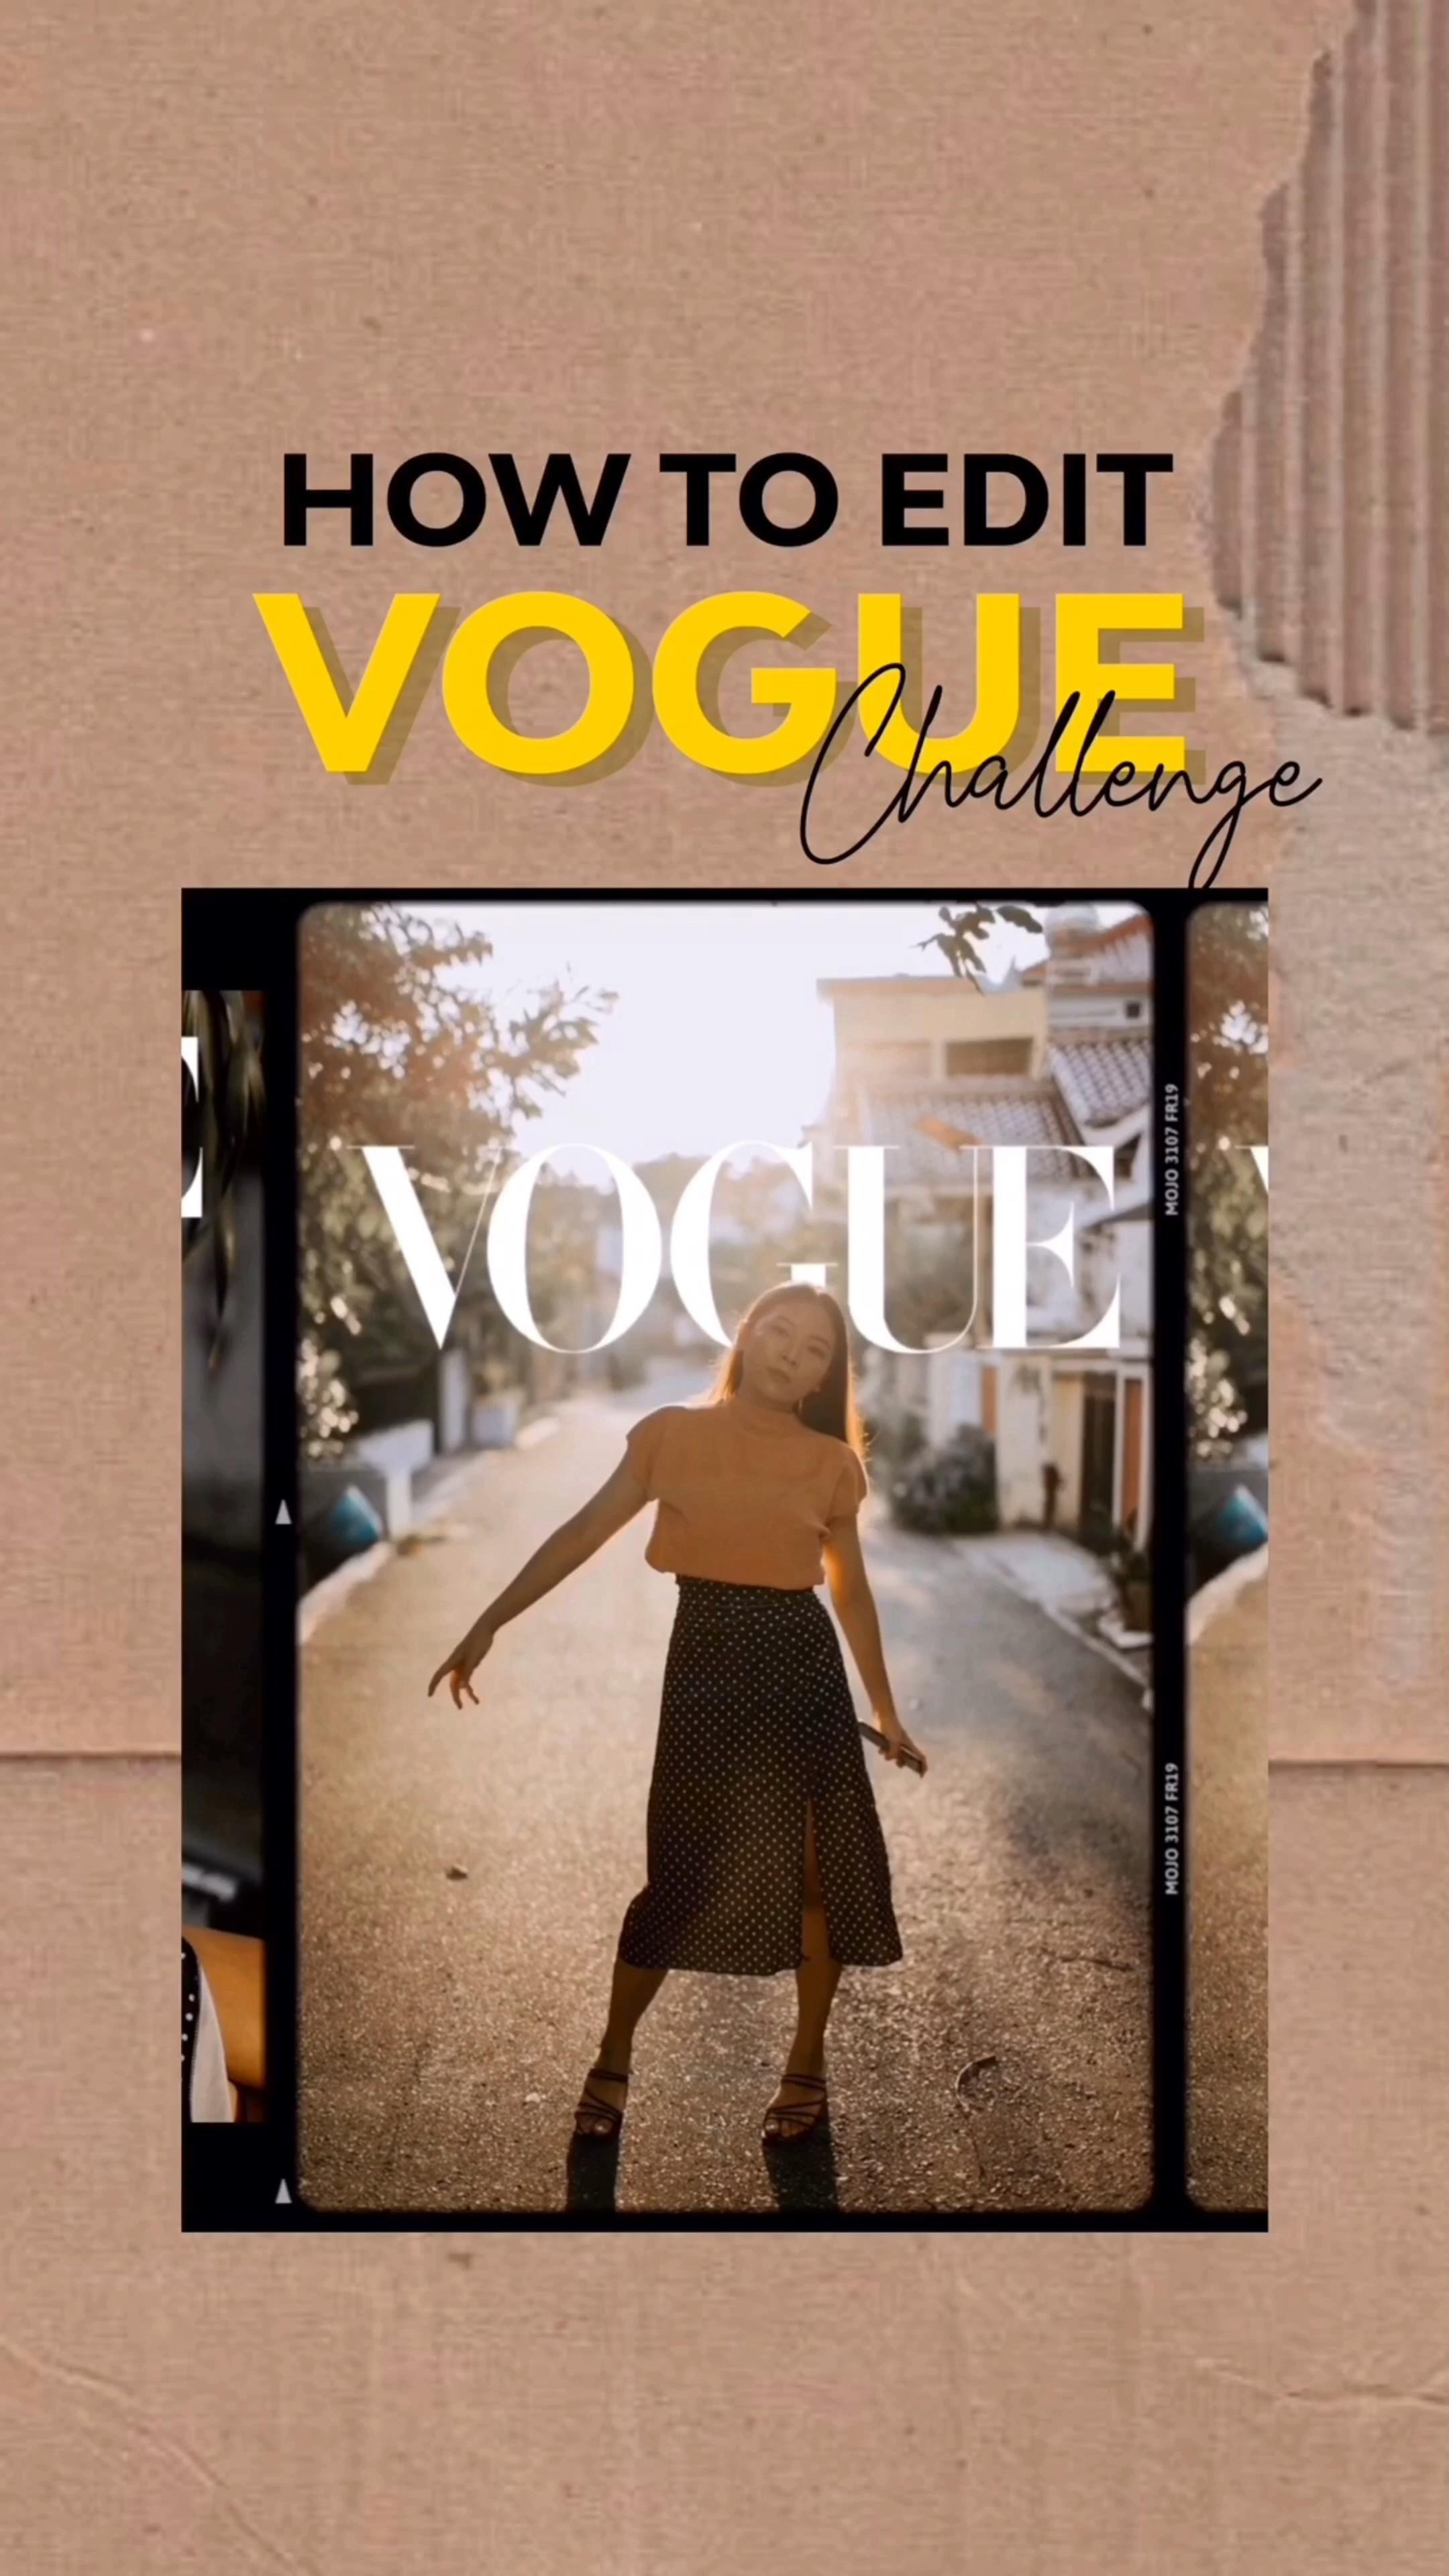 How To Edit Vogue Challenge Video Instagram Editing Challenges Instagram